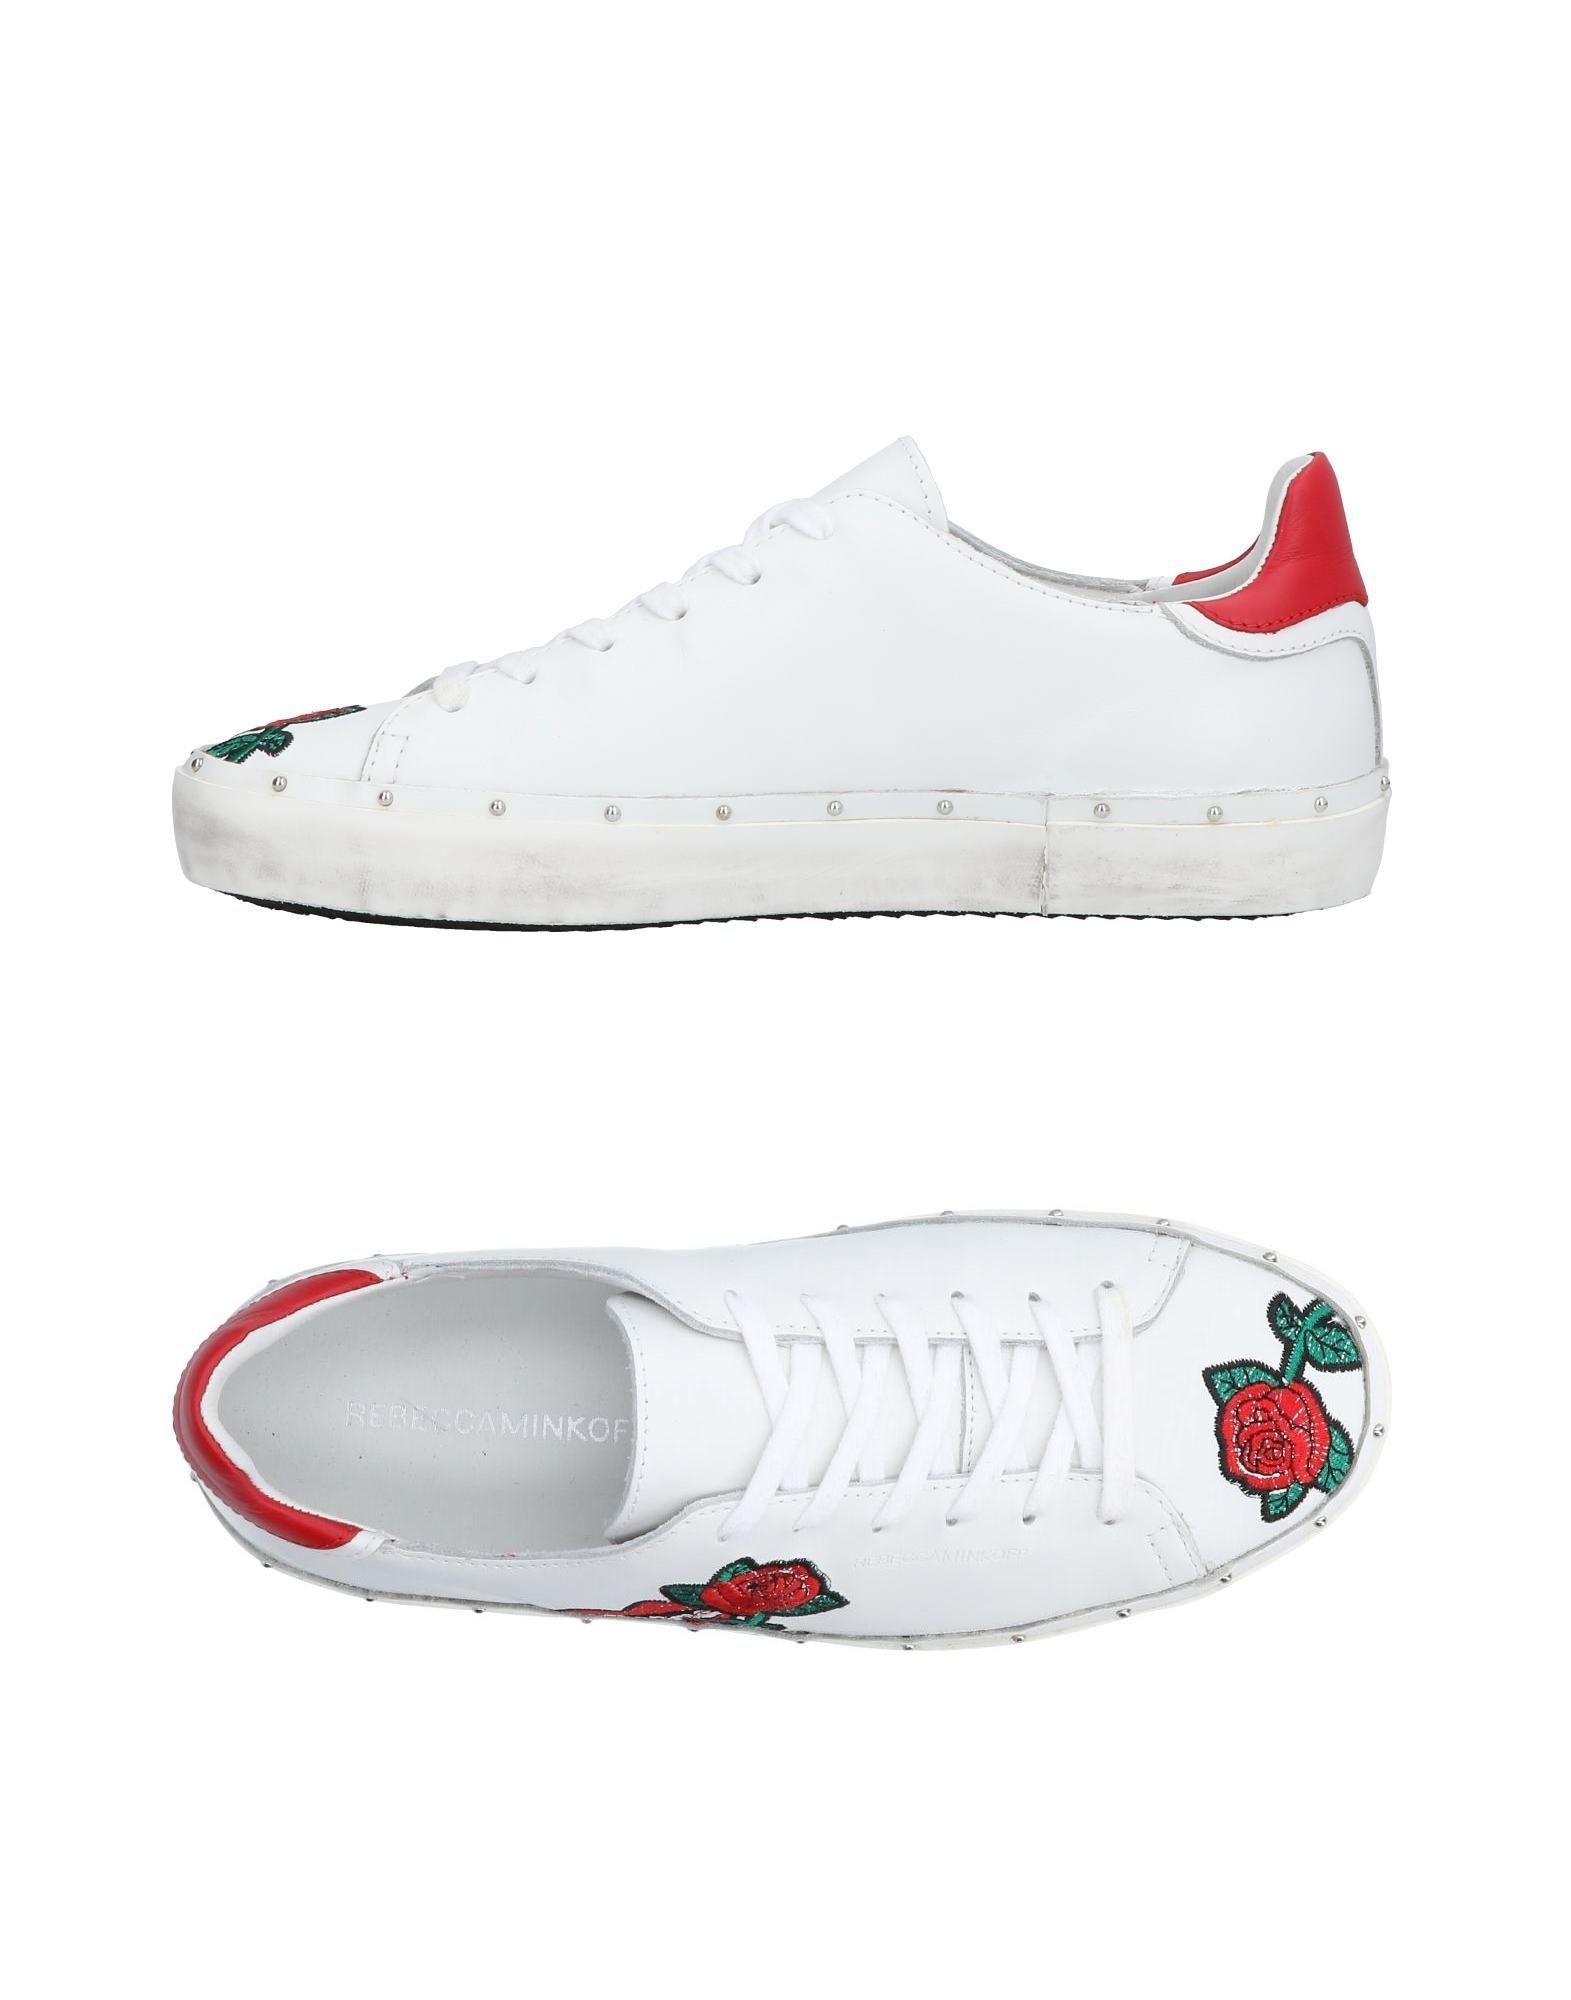 Gut um Minkoff billige Schuhe zu tragenRebecca Minkoff um Sneakers Damen  11449291LB ff2021